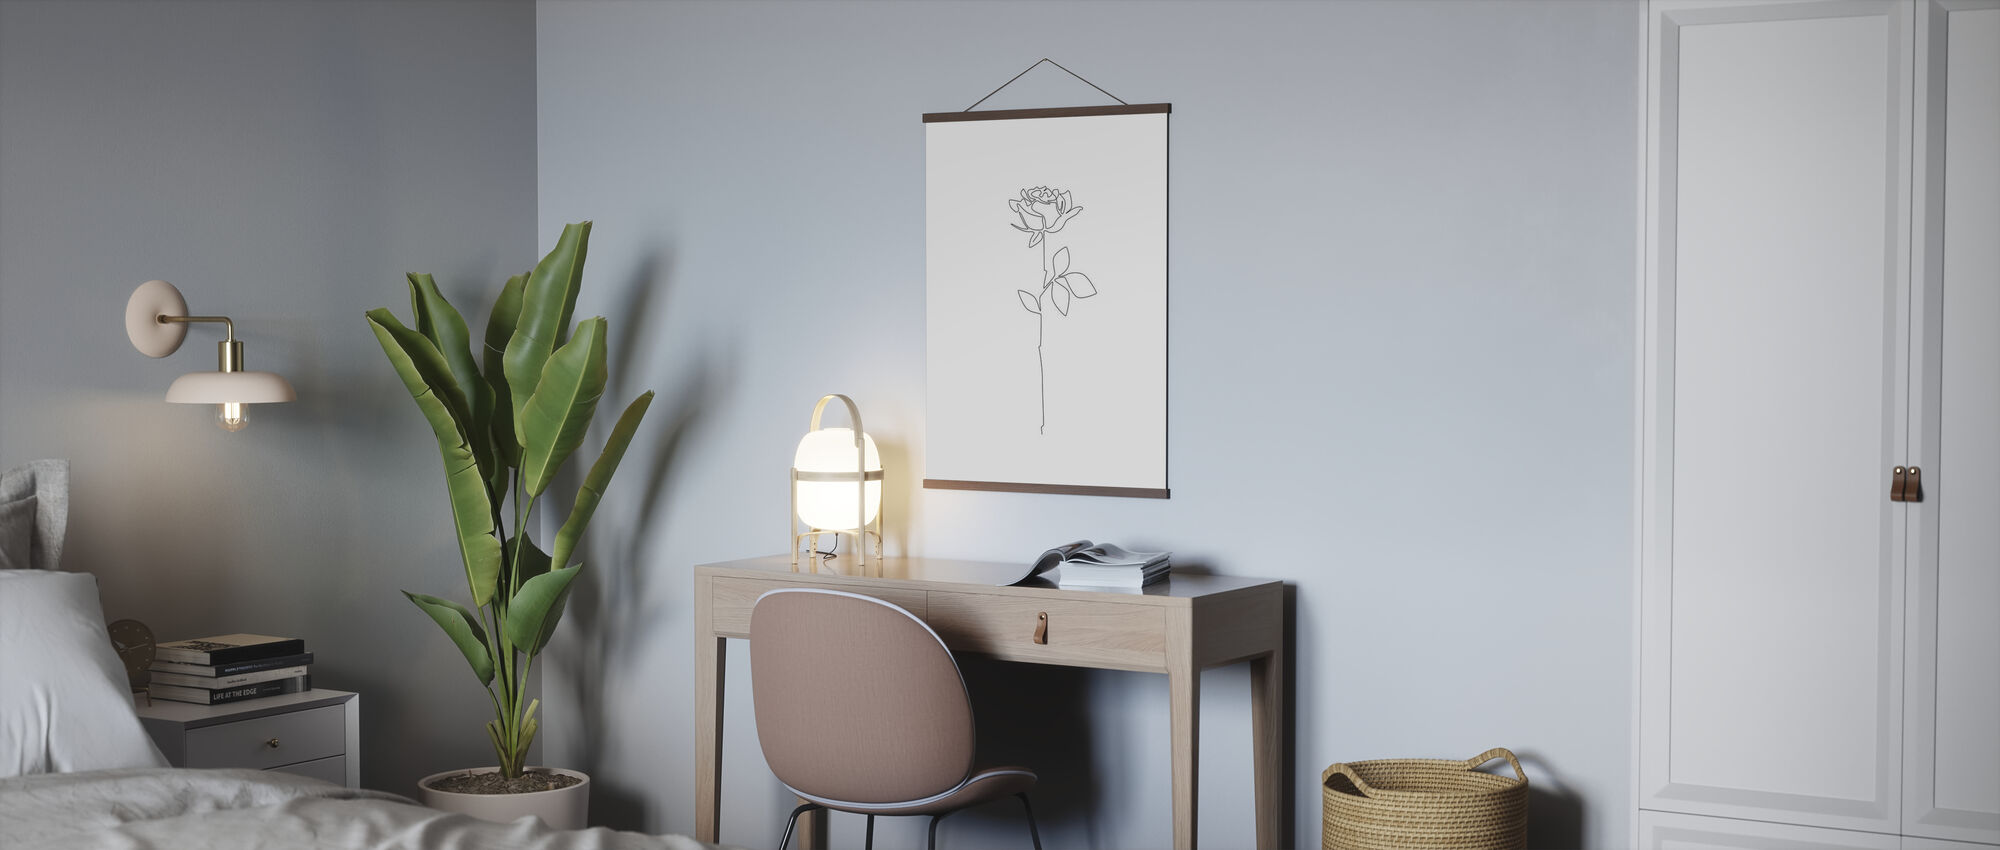 Fragile Rose - Poster - Office